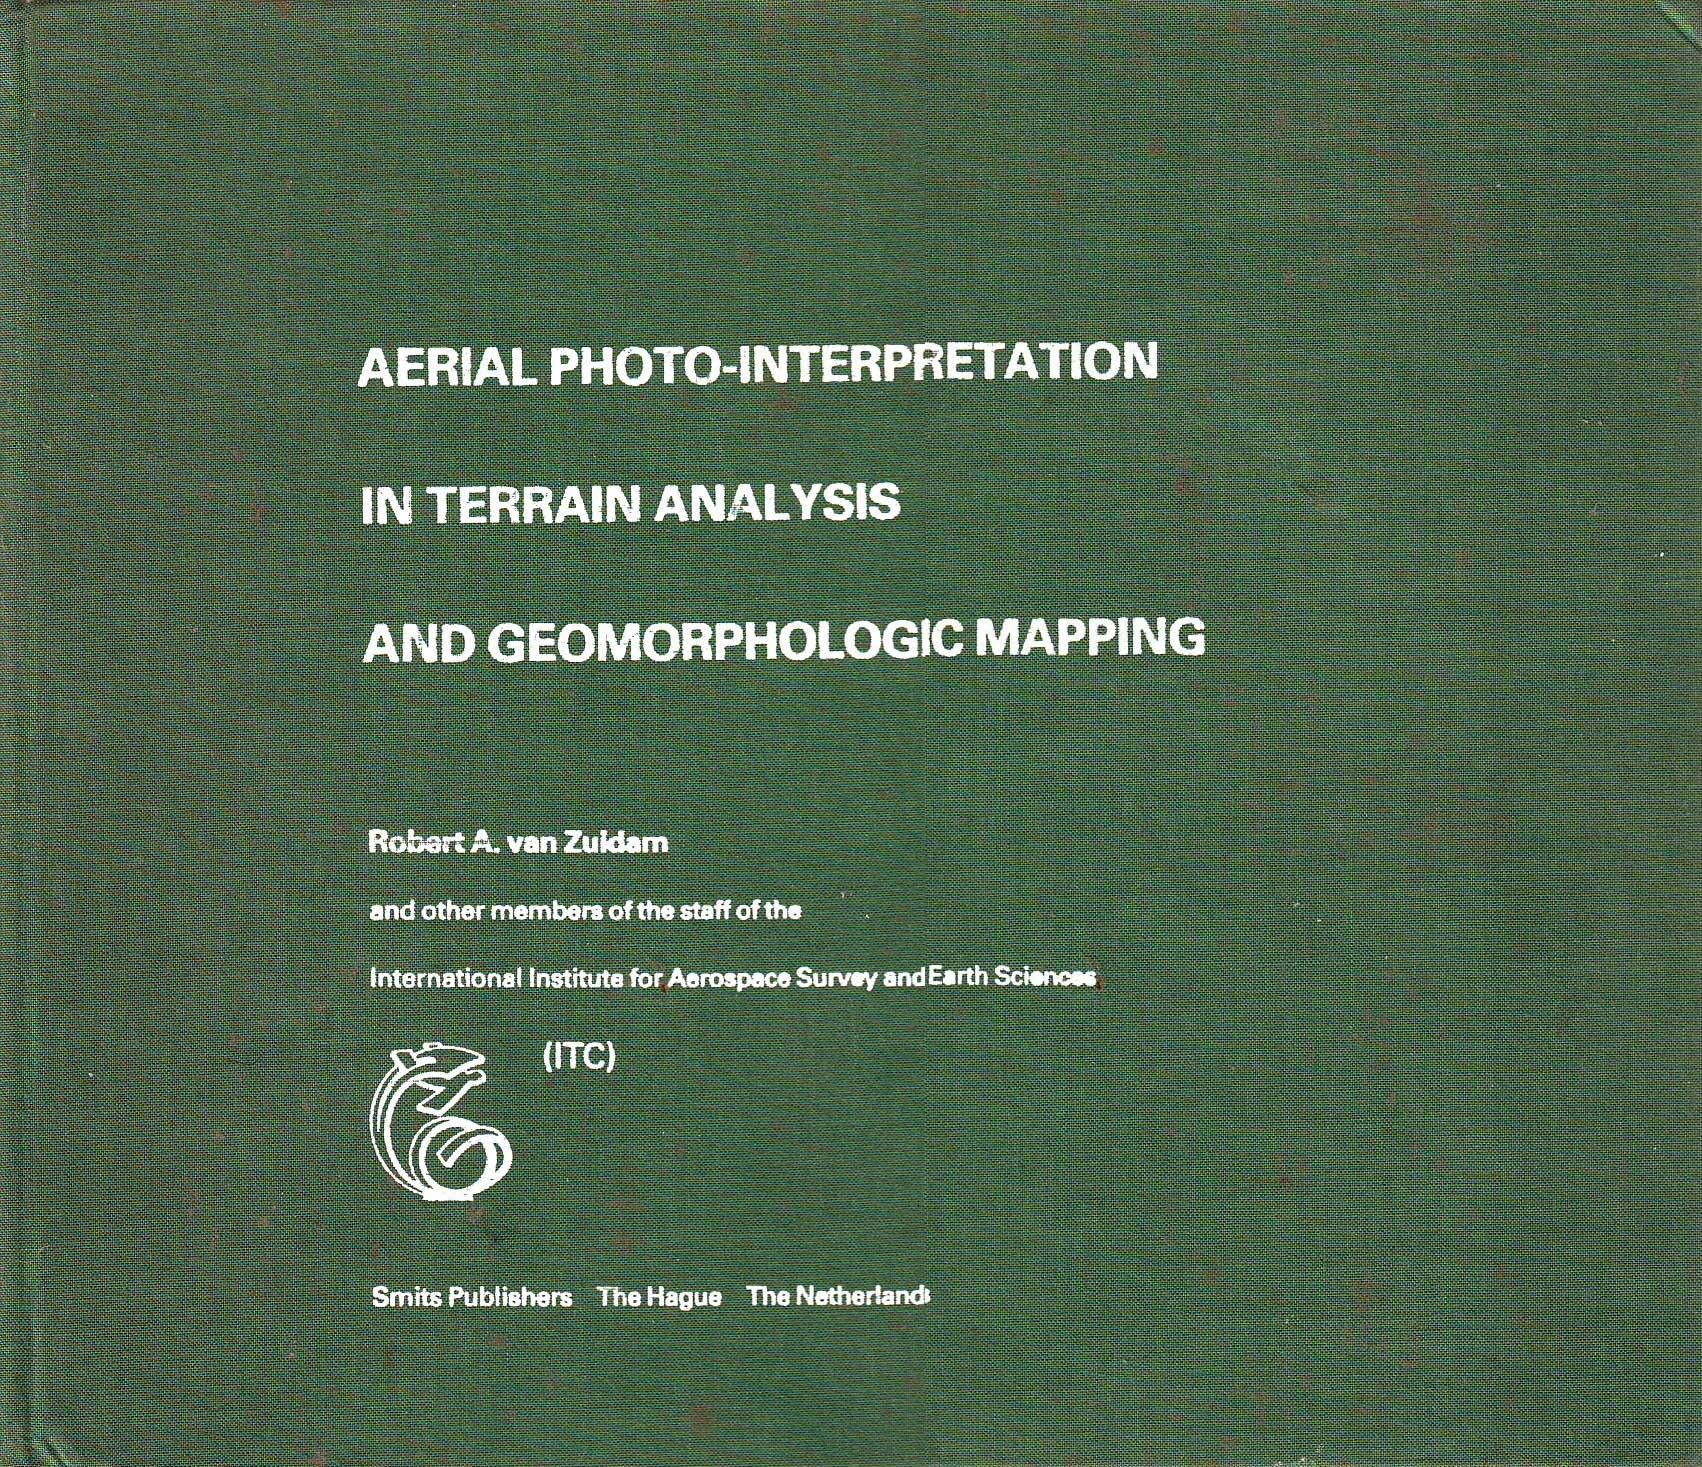 Aerial Photo-Interpretation in Terrain Analysis and Geomorphologic Mapping